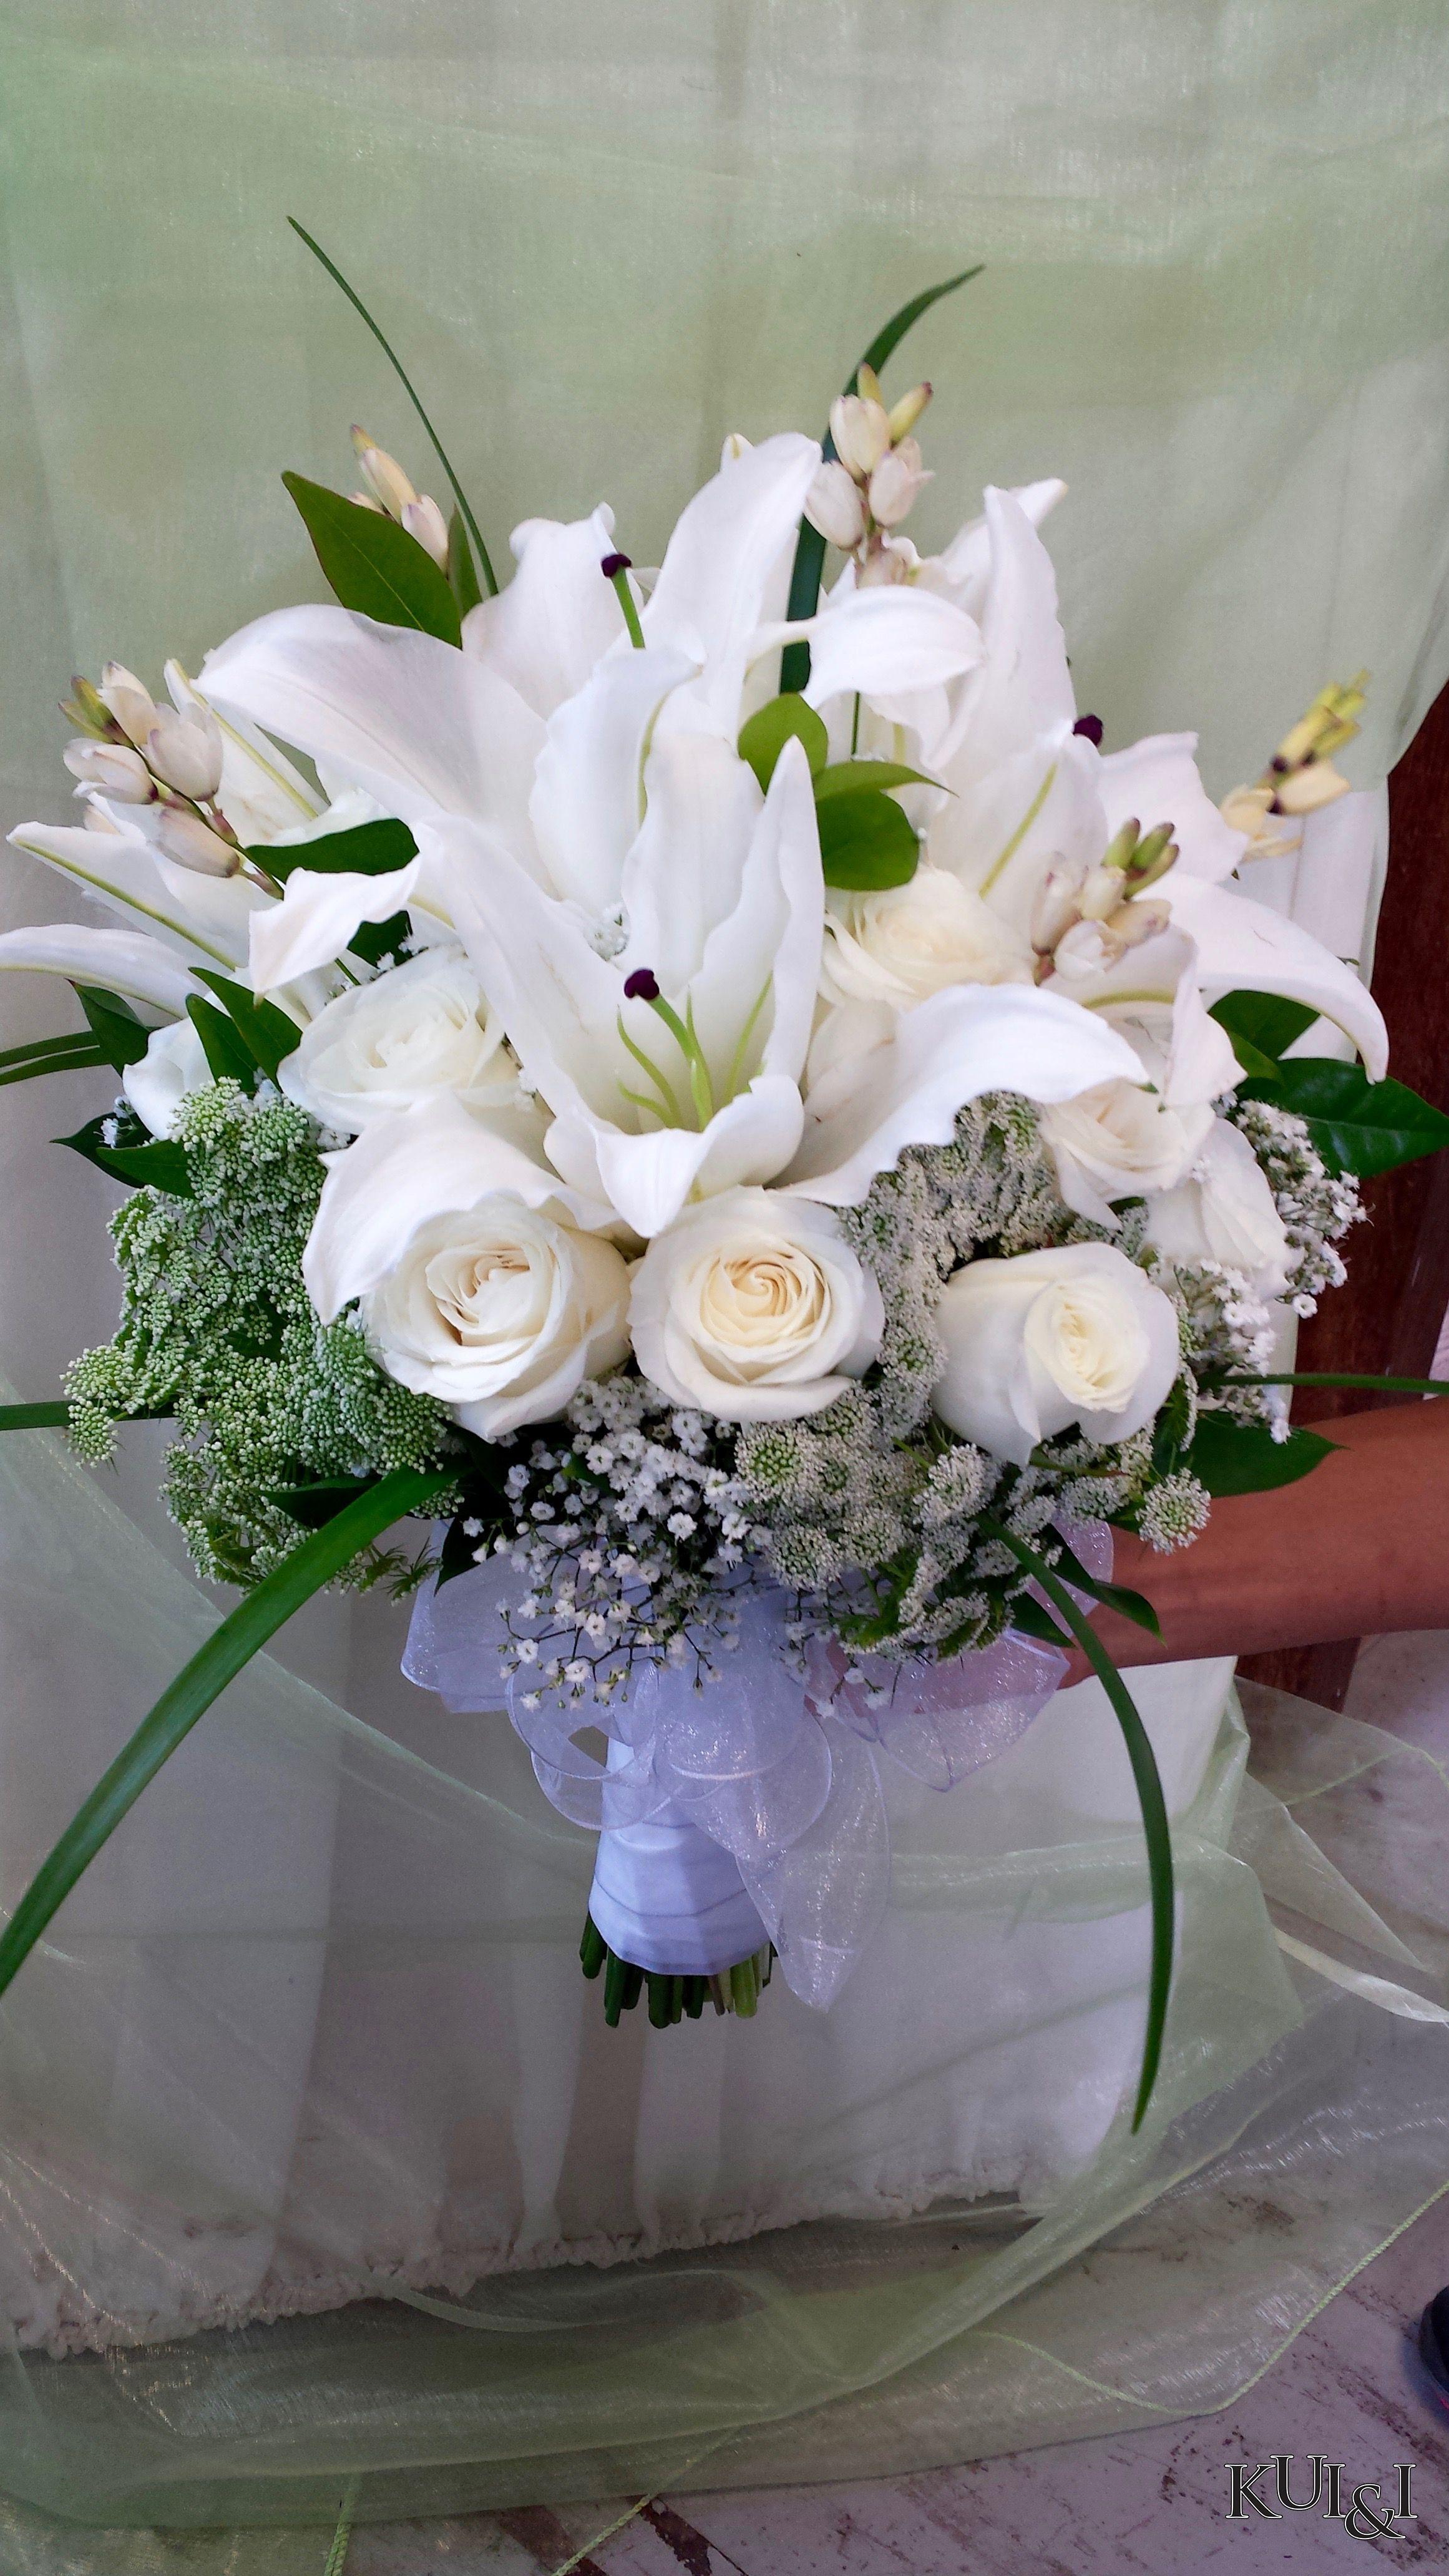 Traditional White Wedding Bouquet Kui I Florist Llc Hilo Hawaii